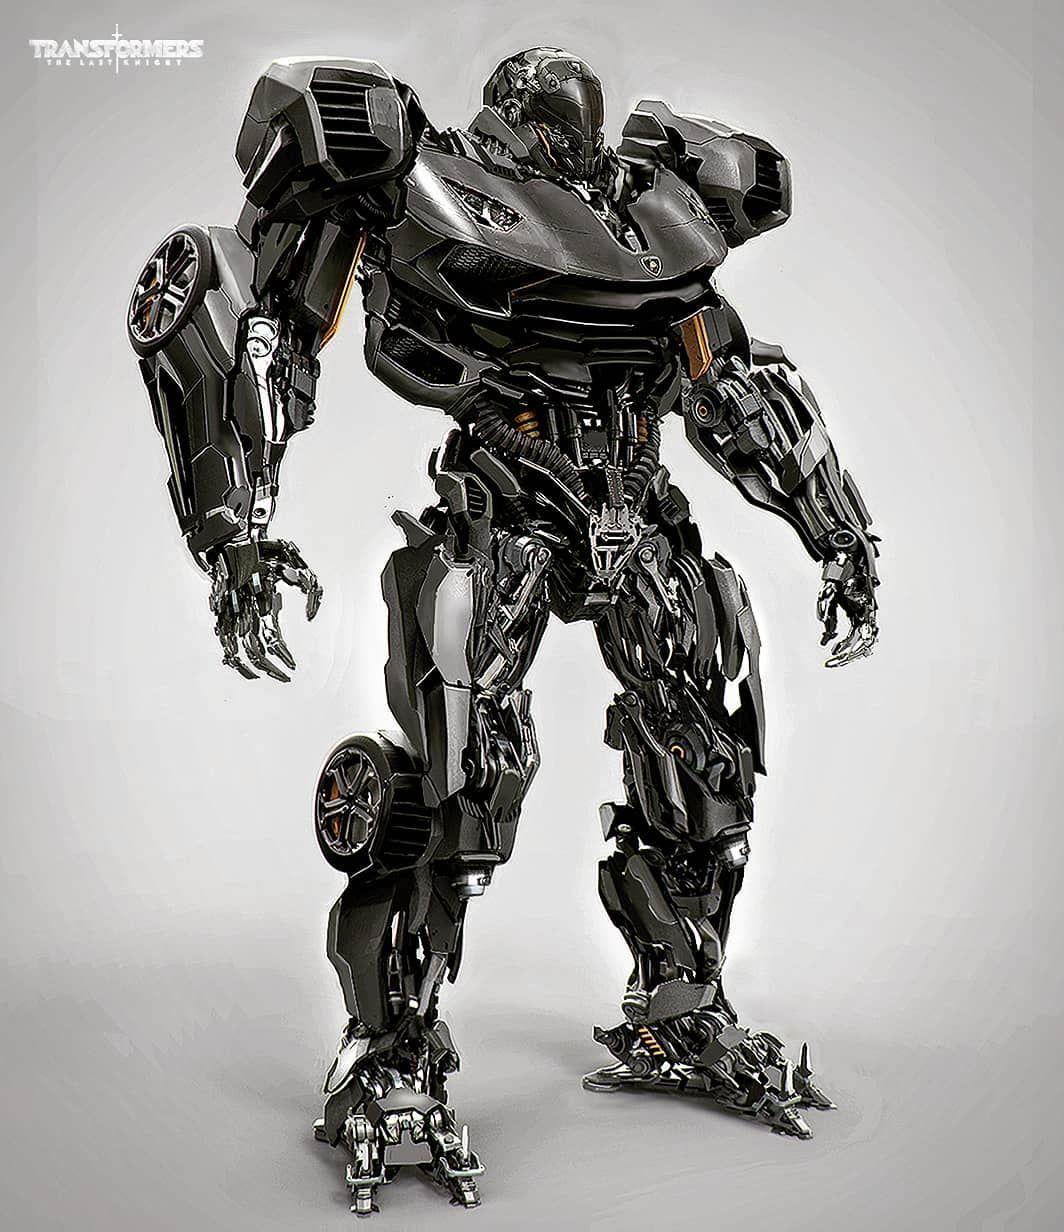 24+ Transformer art ideas